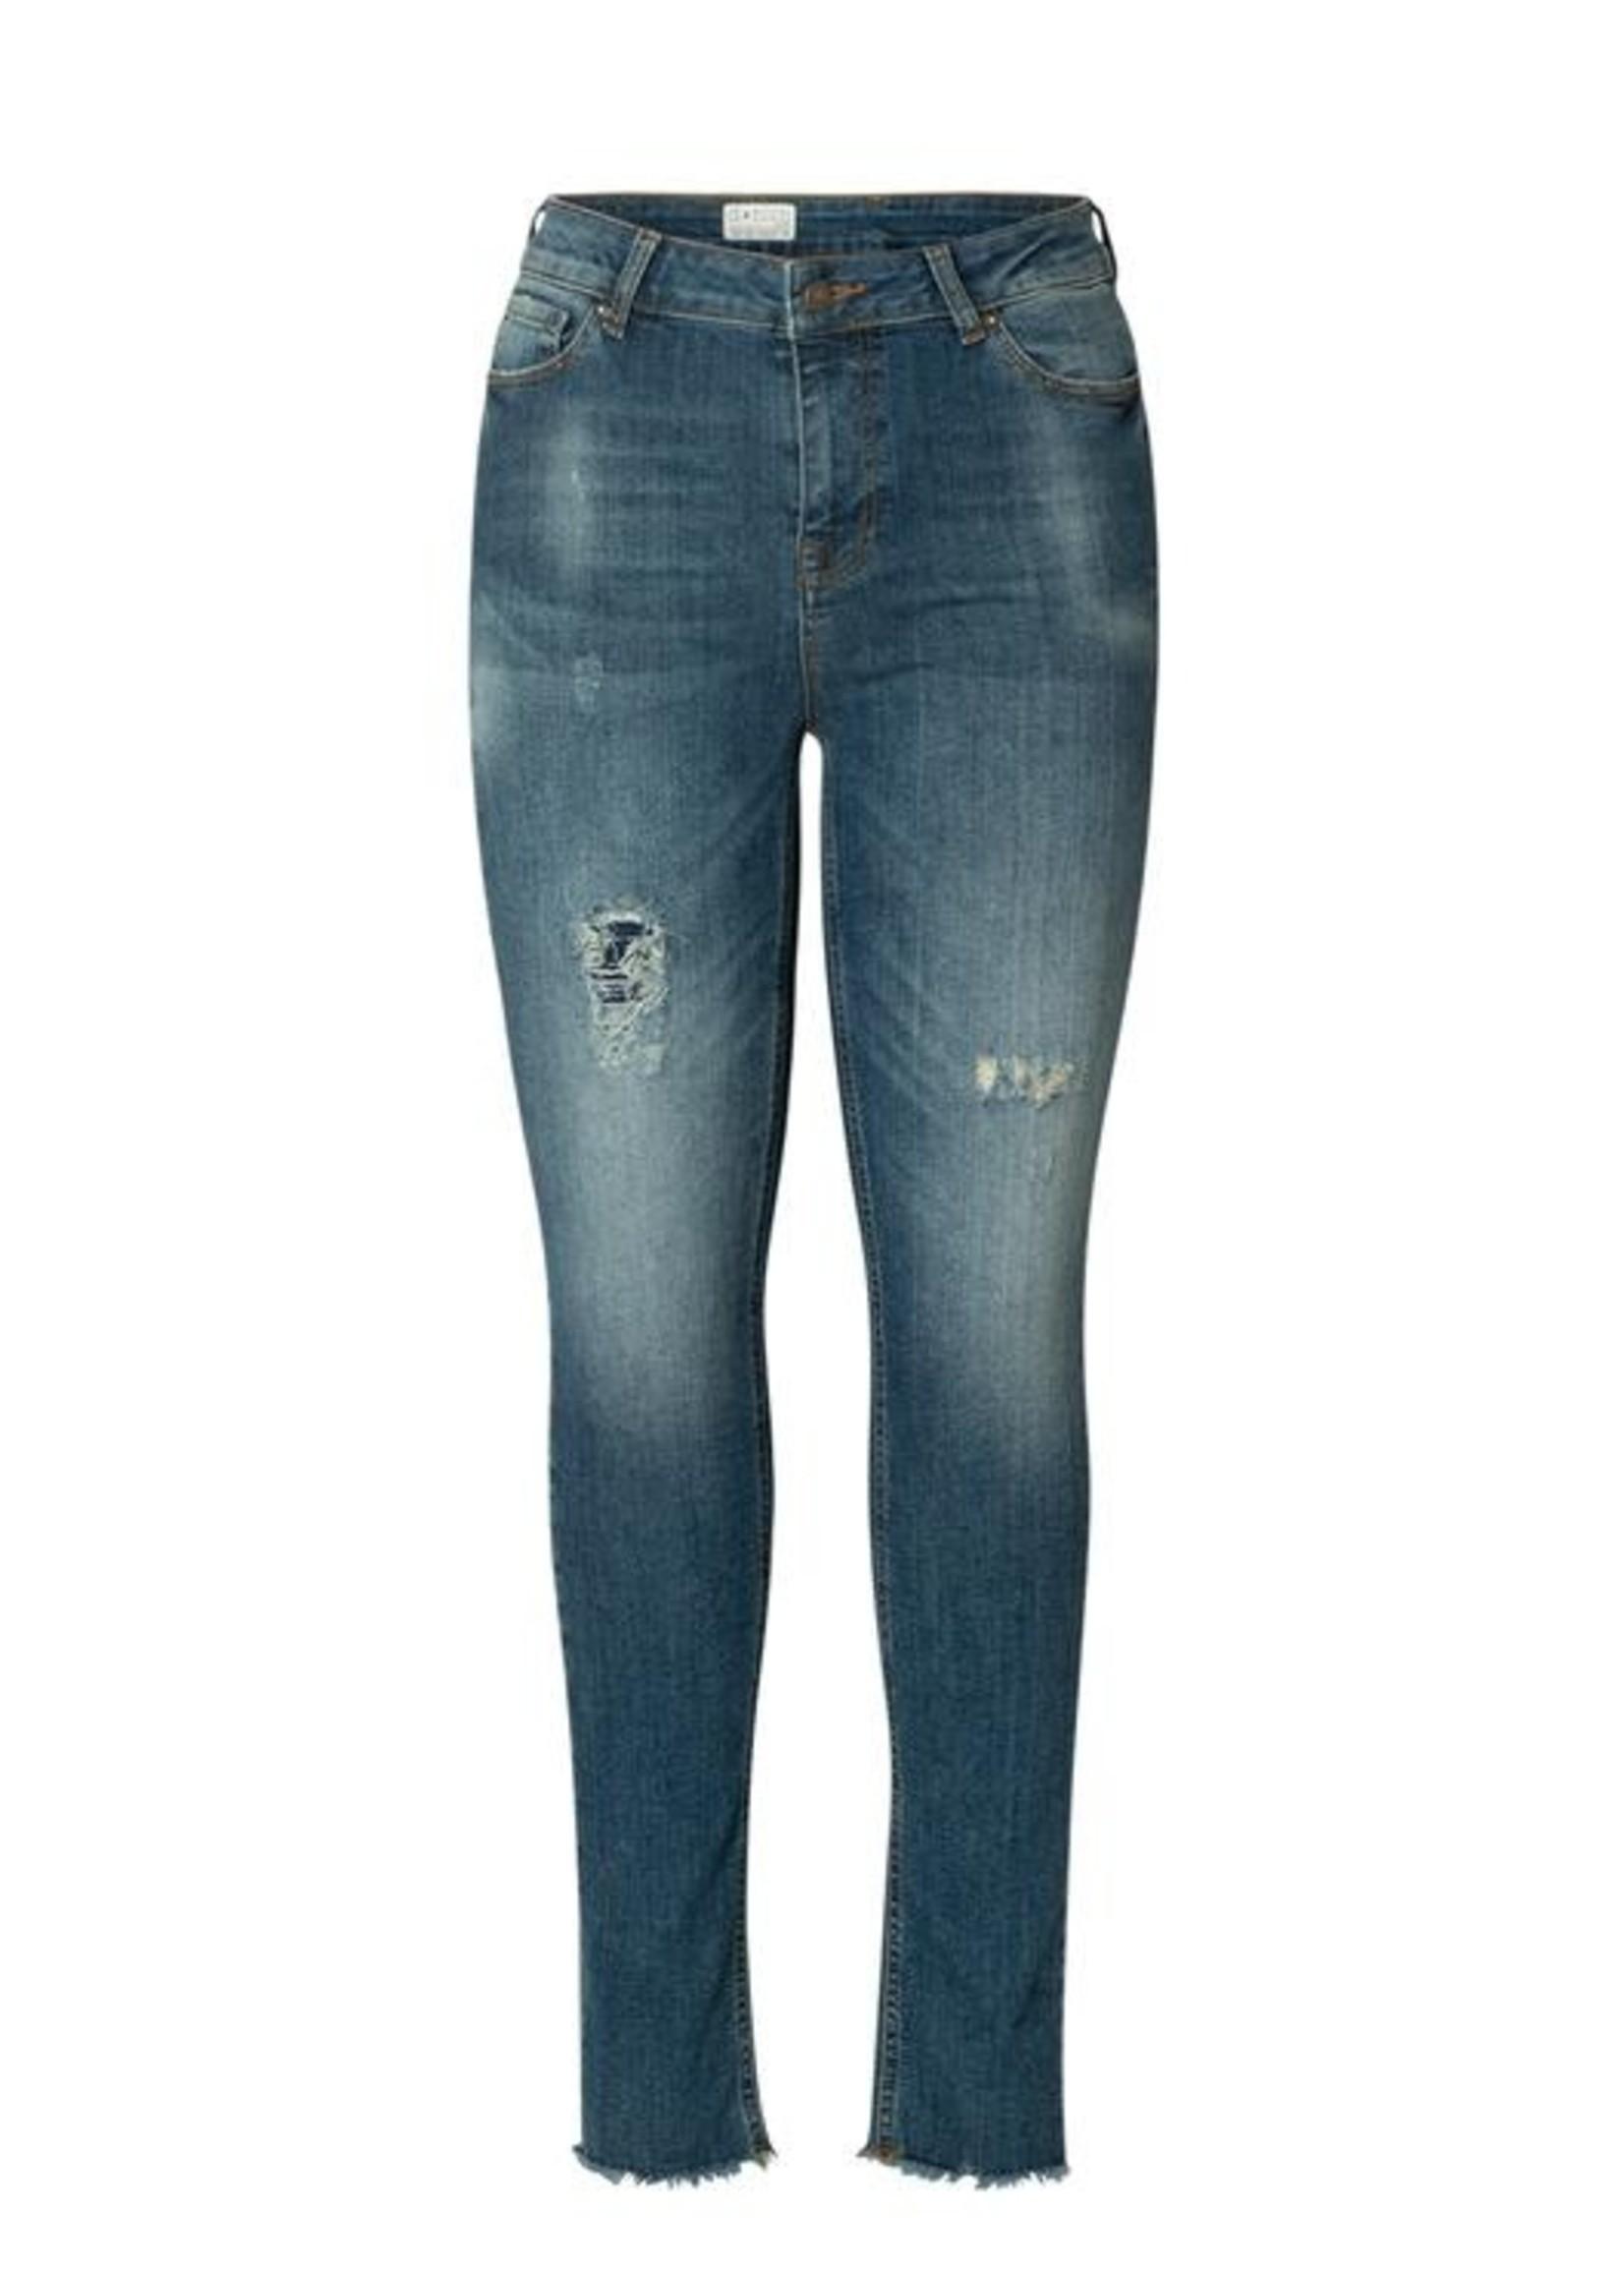 Yest Yest Ann Destroyed Jeans